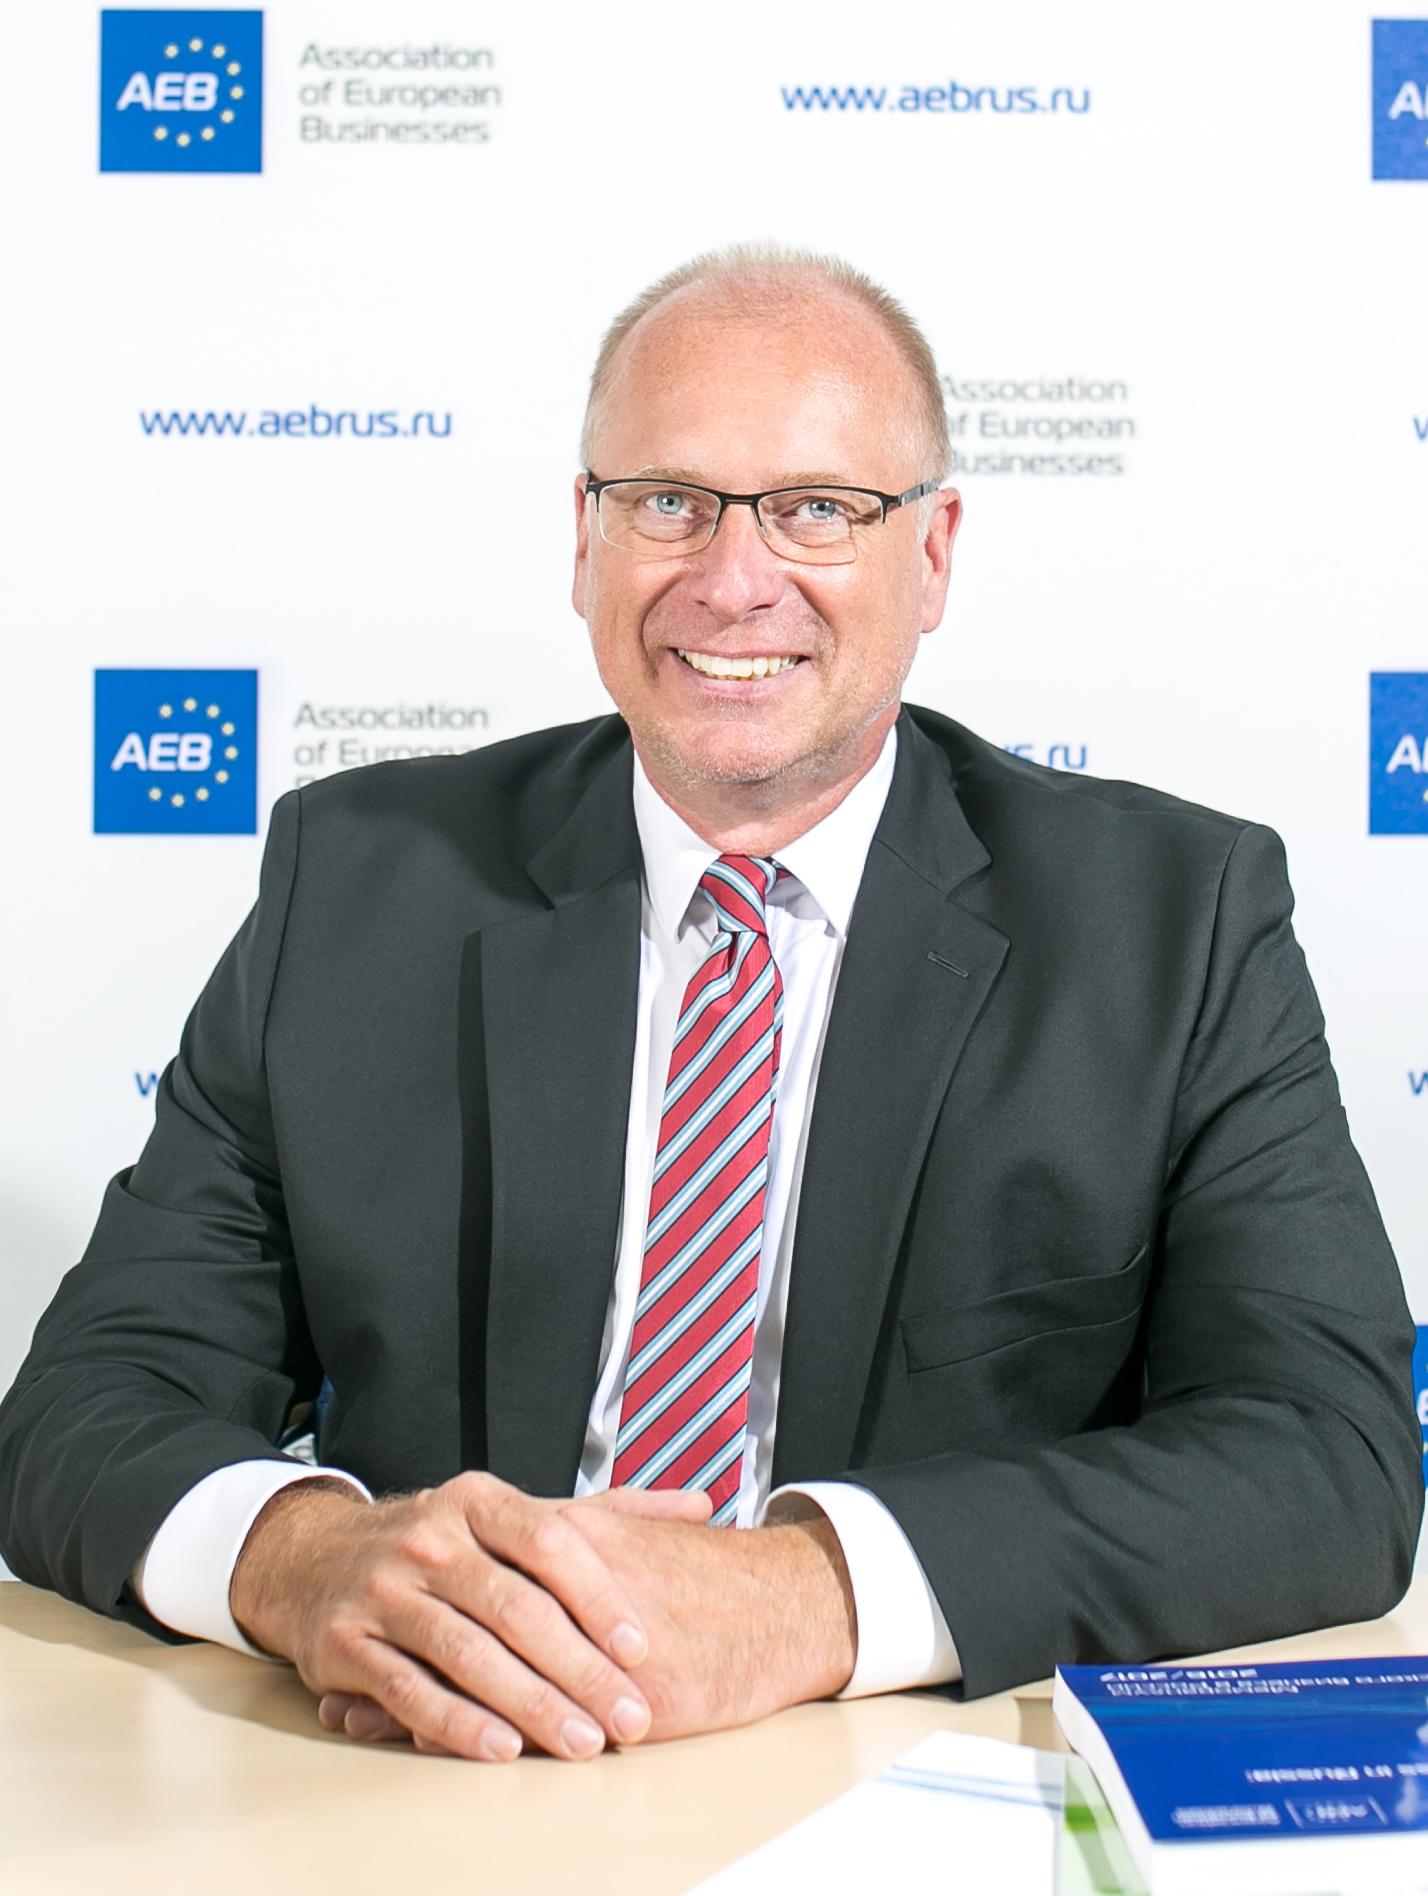 Frank Schauff - CEO, Association of European Businesses (AEB)